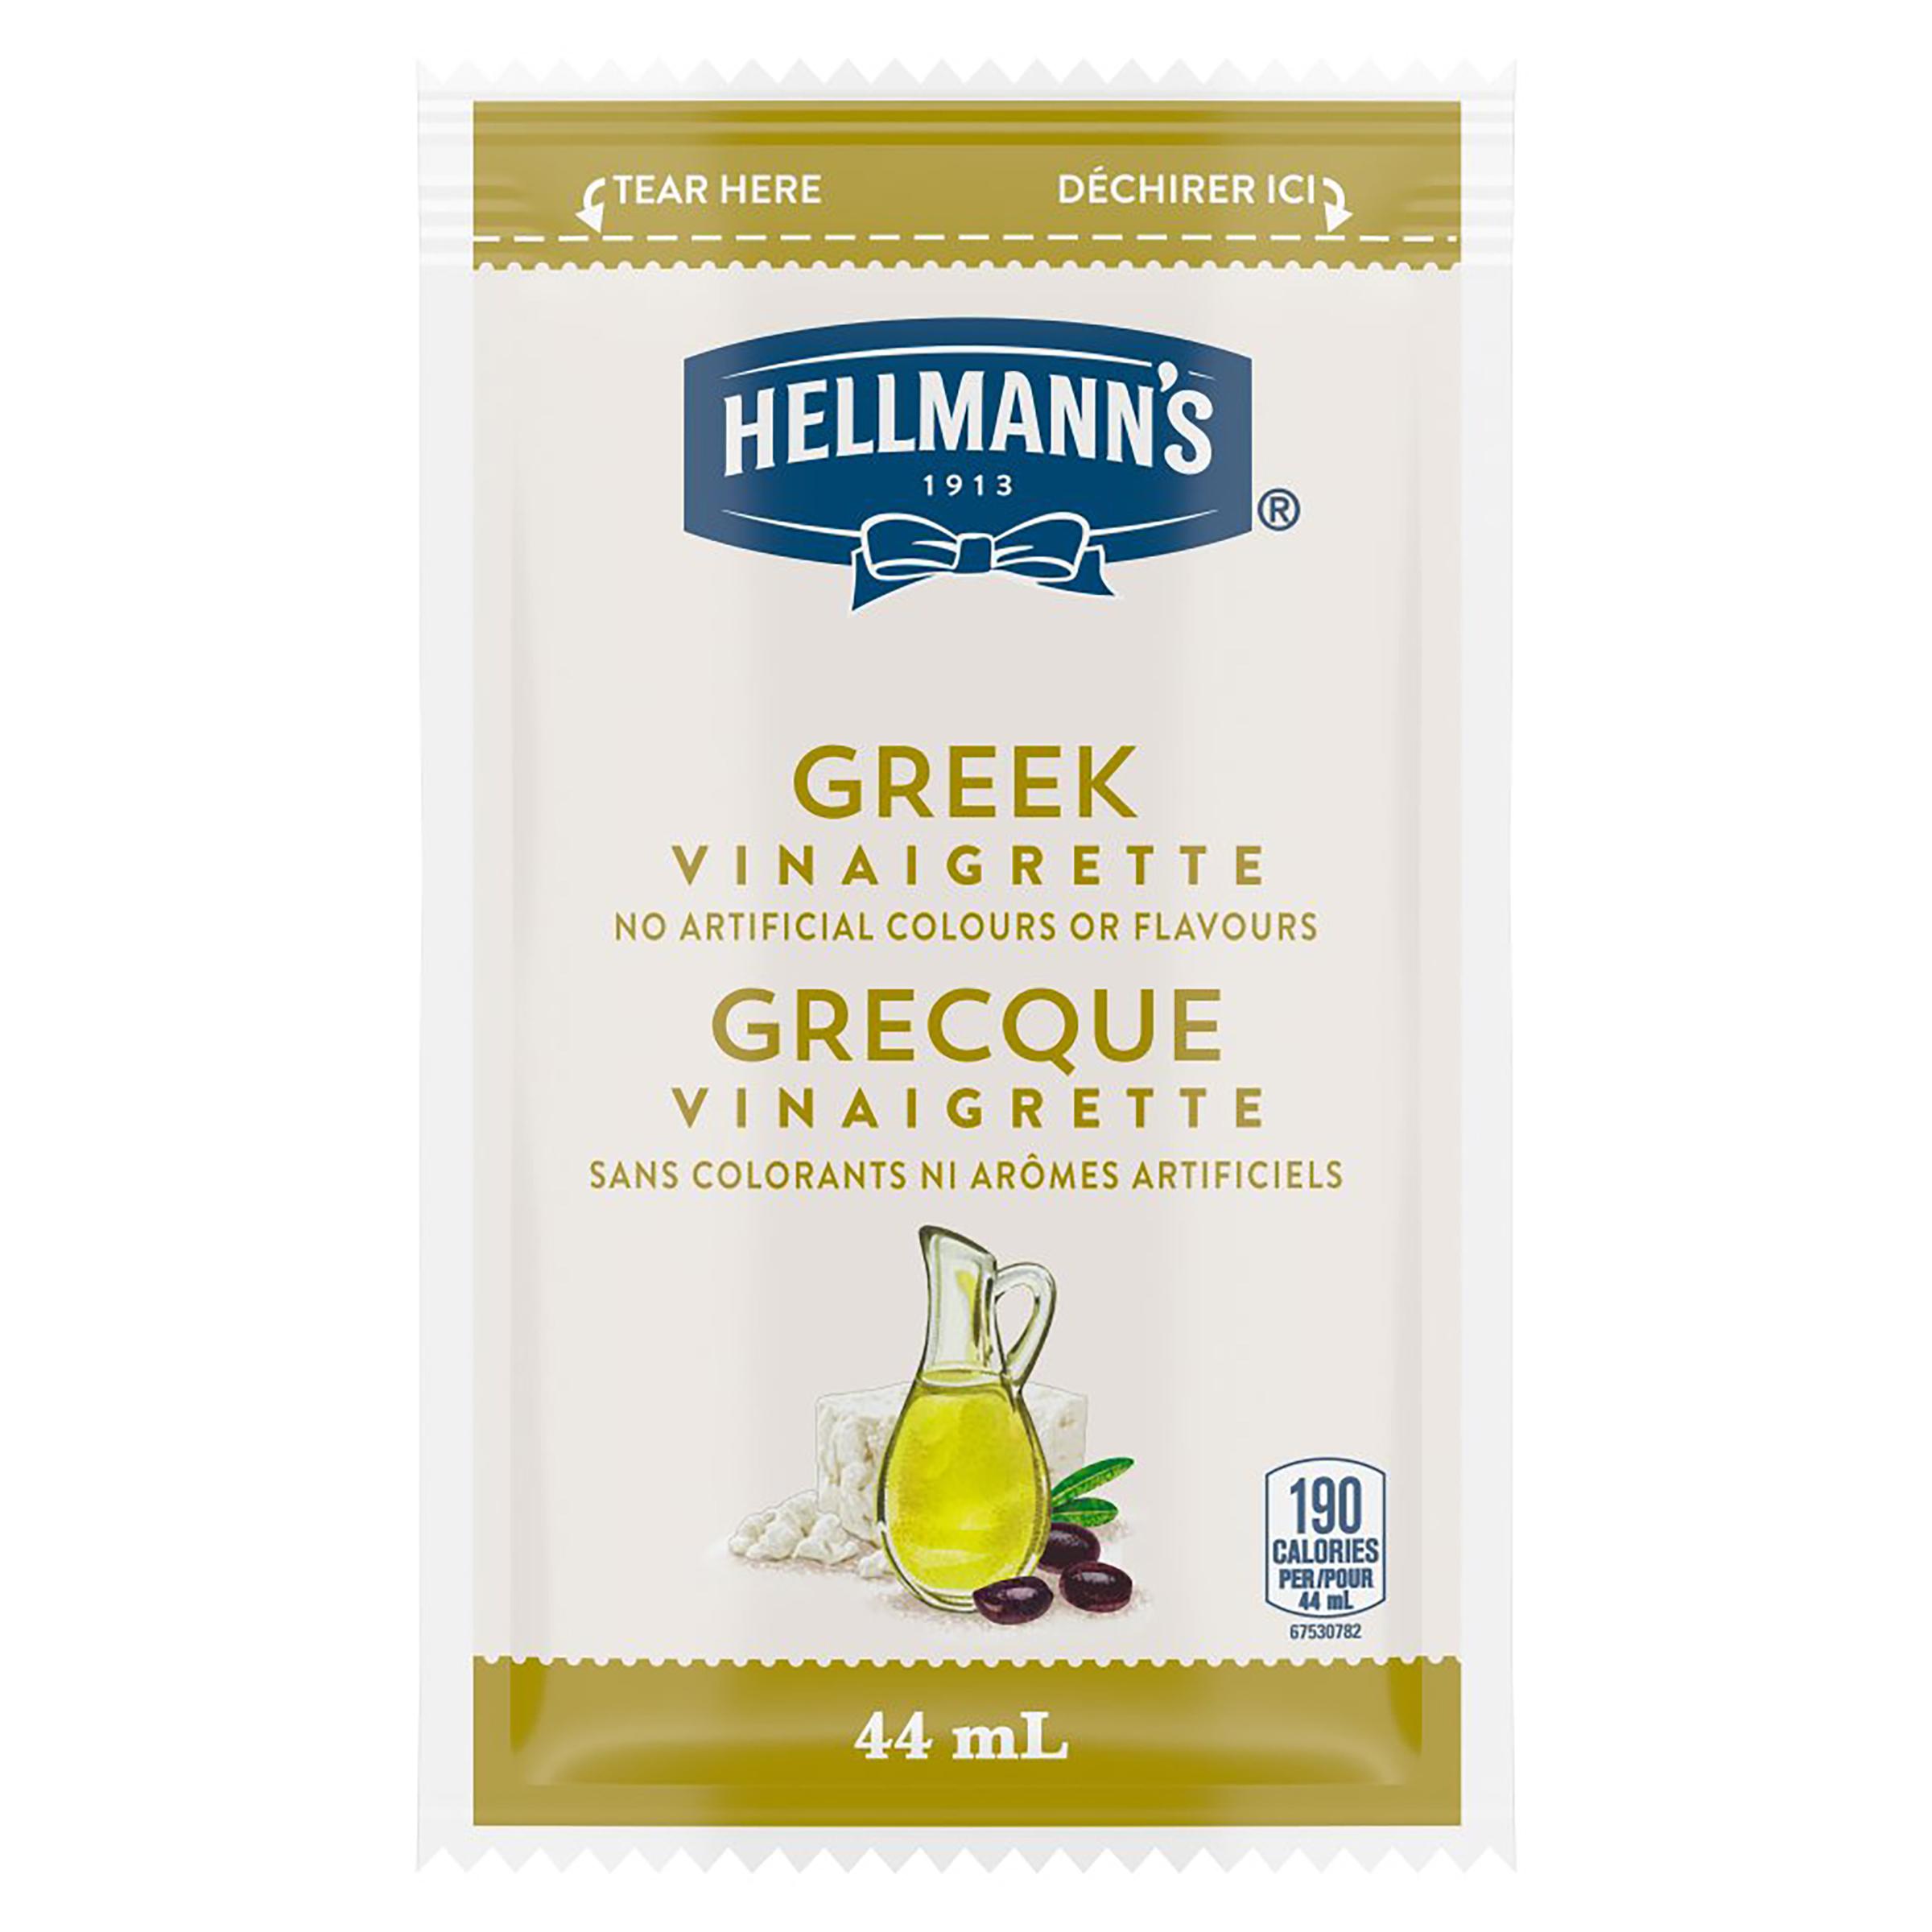 Hellmann's® Salad Dressing Portion Control Sachet Greek Vinaigrette 44 ml, pack of 102 -